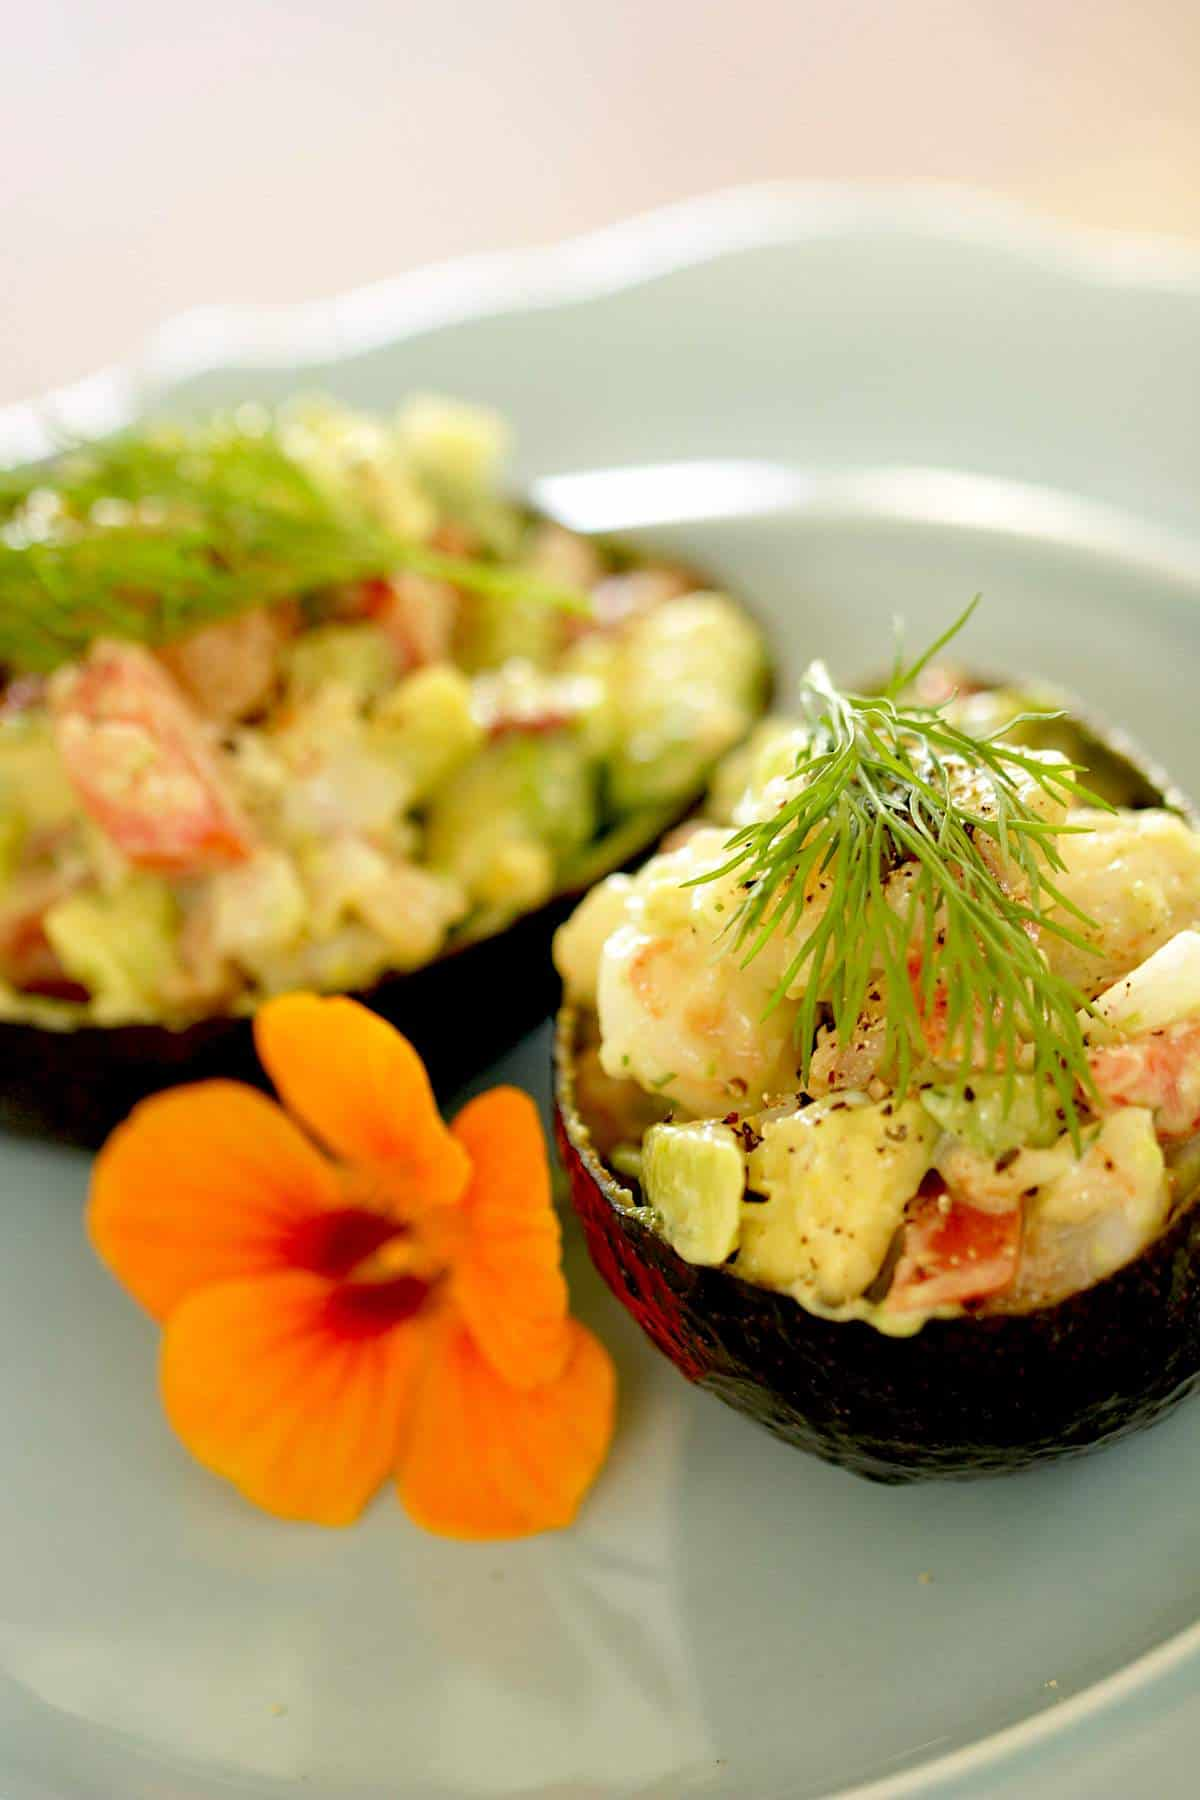 Avocado shells filled with shrimp salad